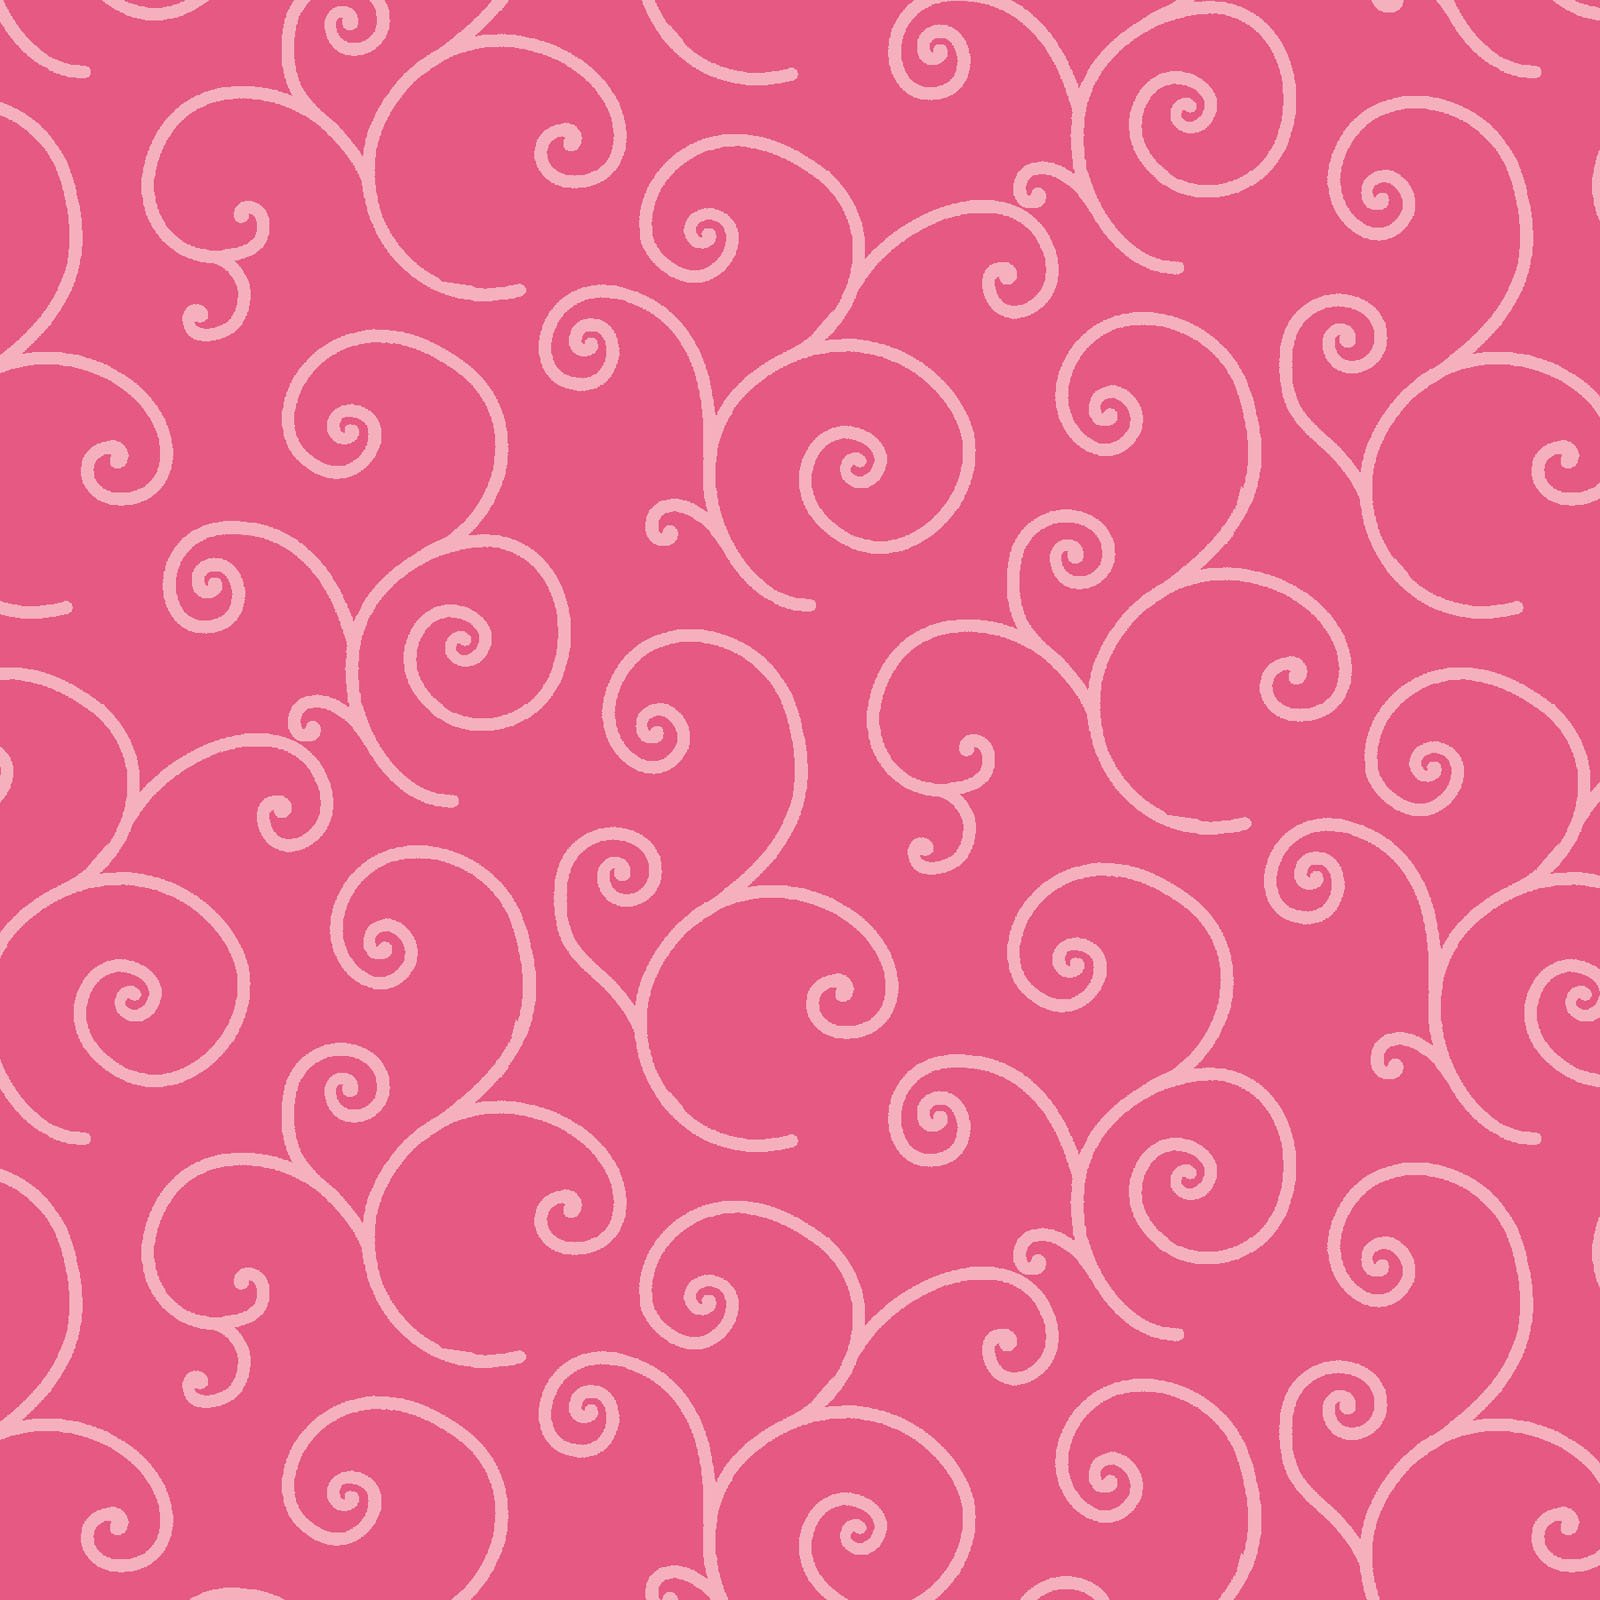 KimberBell Basics Pink Scroll 8243M-PP